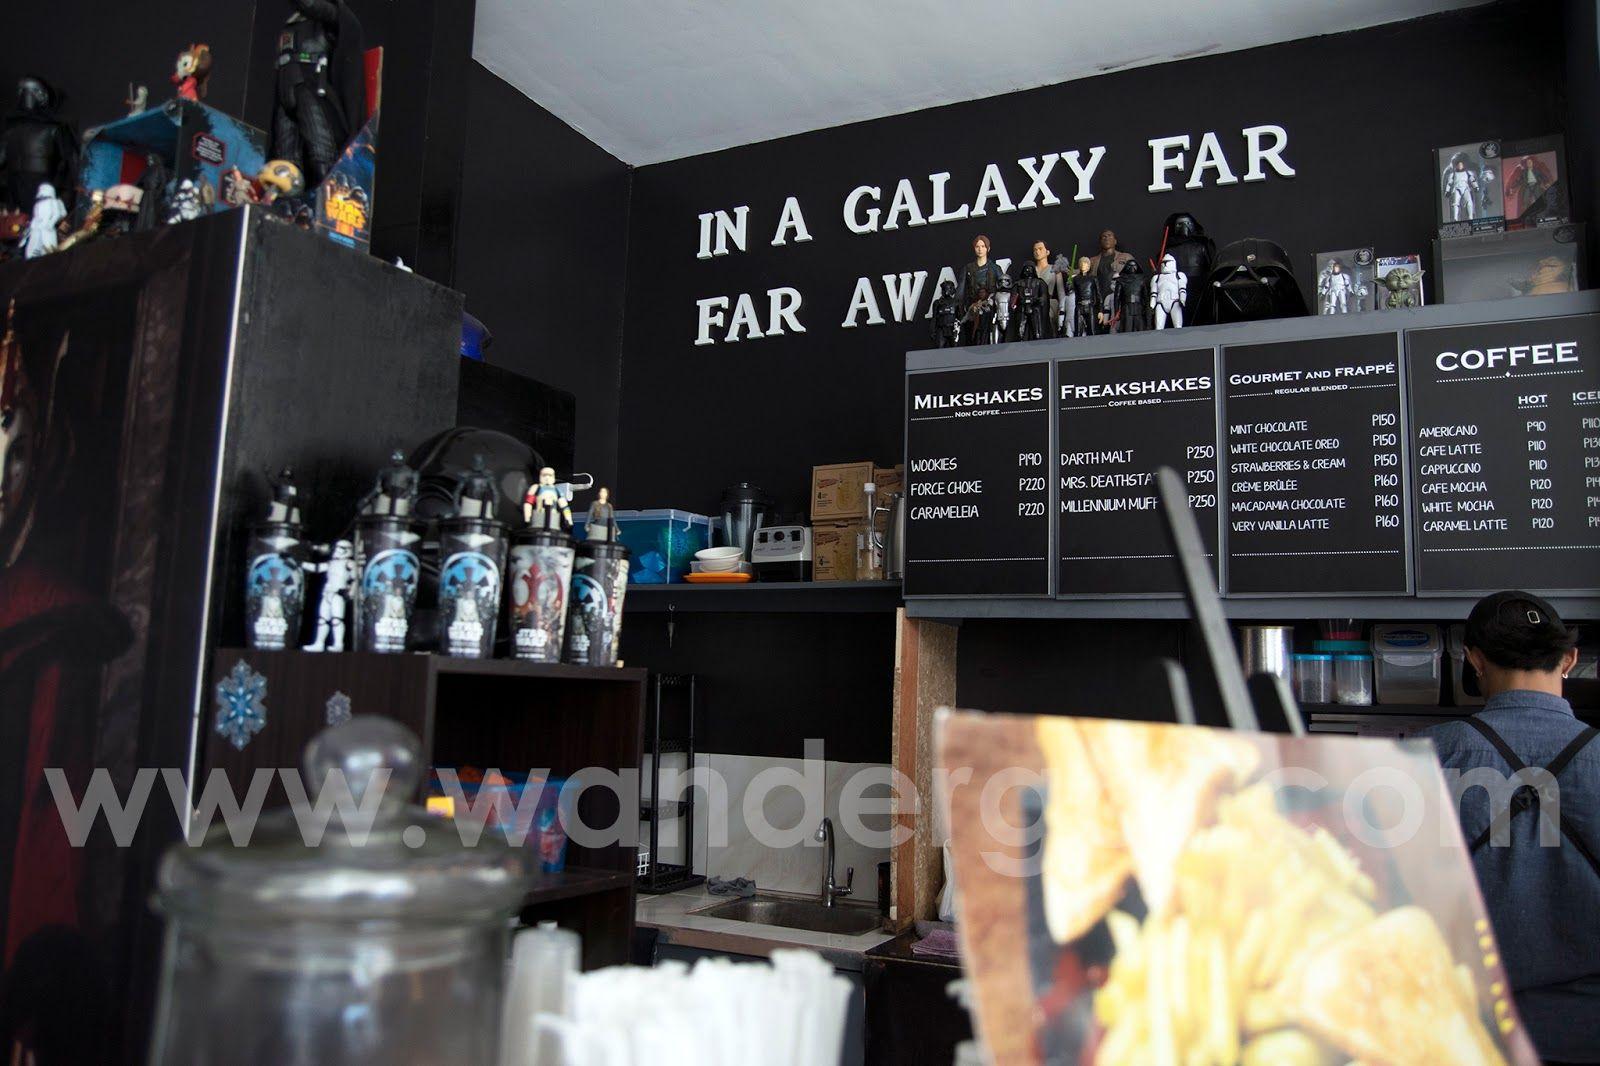 star wars themed cafe in cebu Themed cafes, Star wars